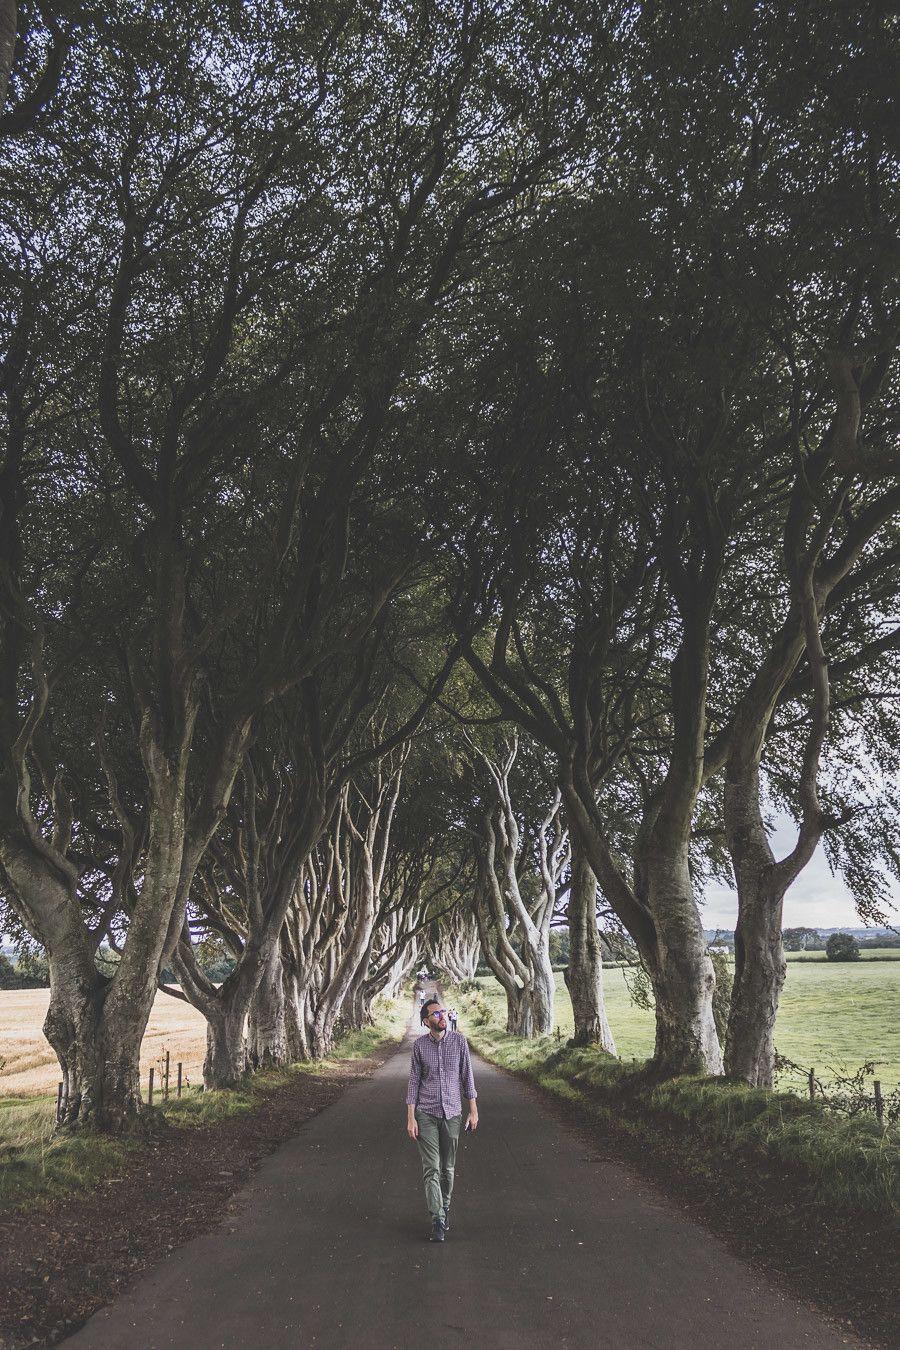 dark hdges - vieux arbres en irlande du nord